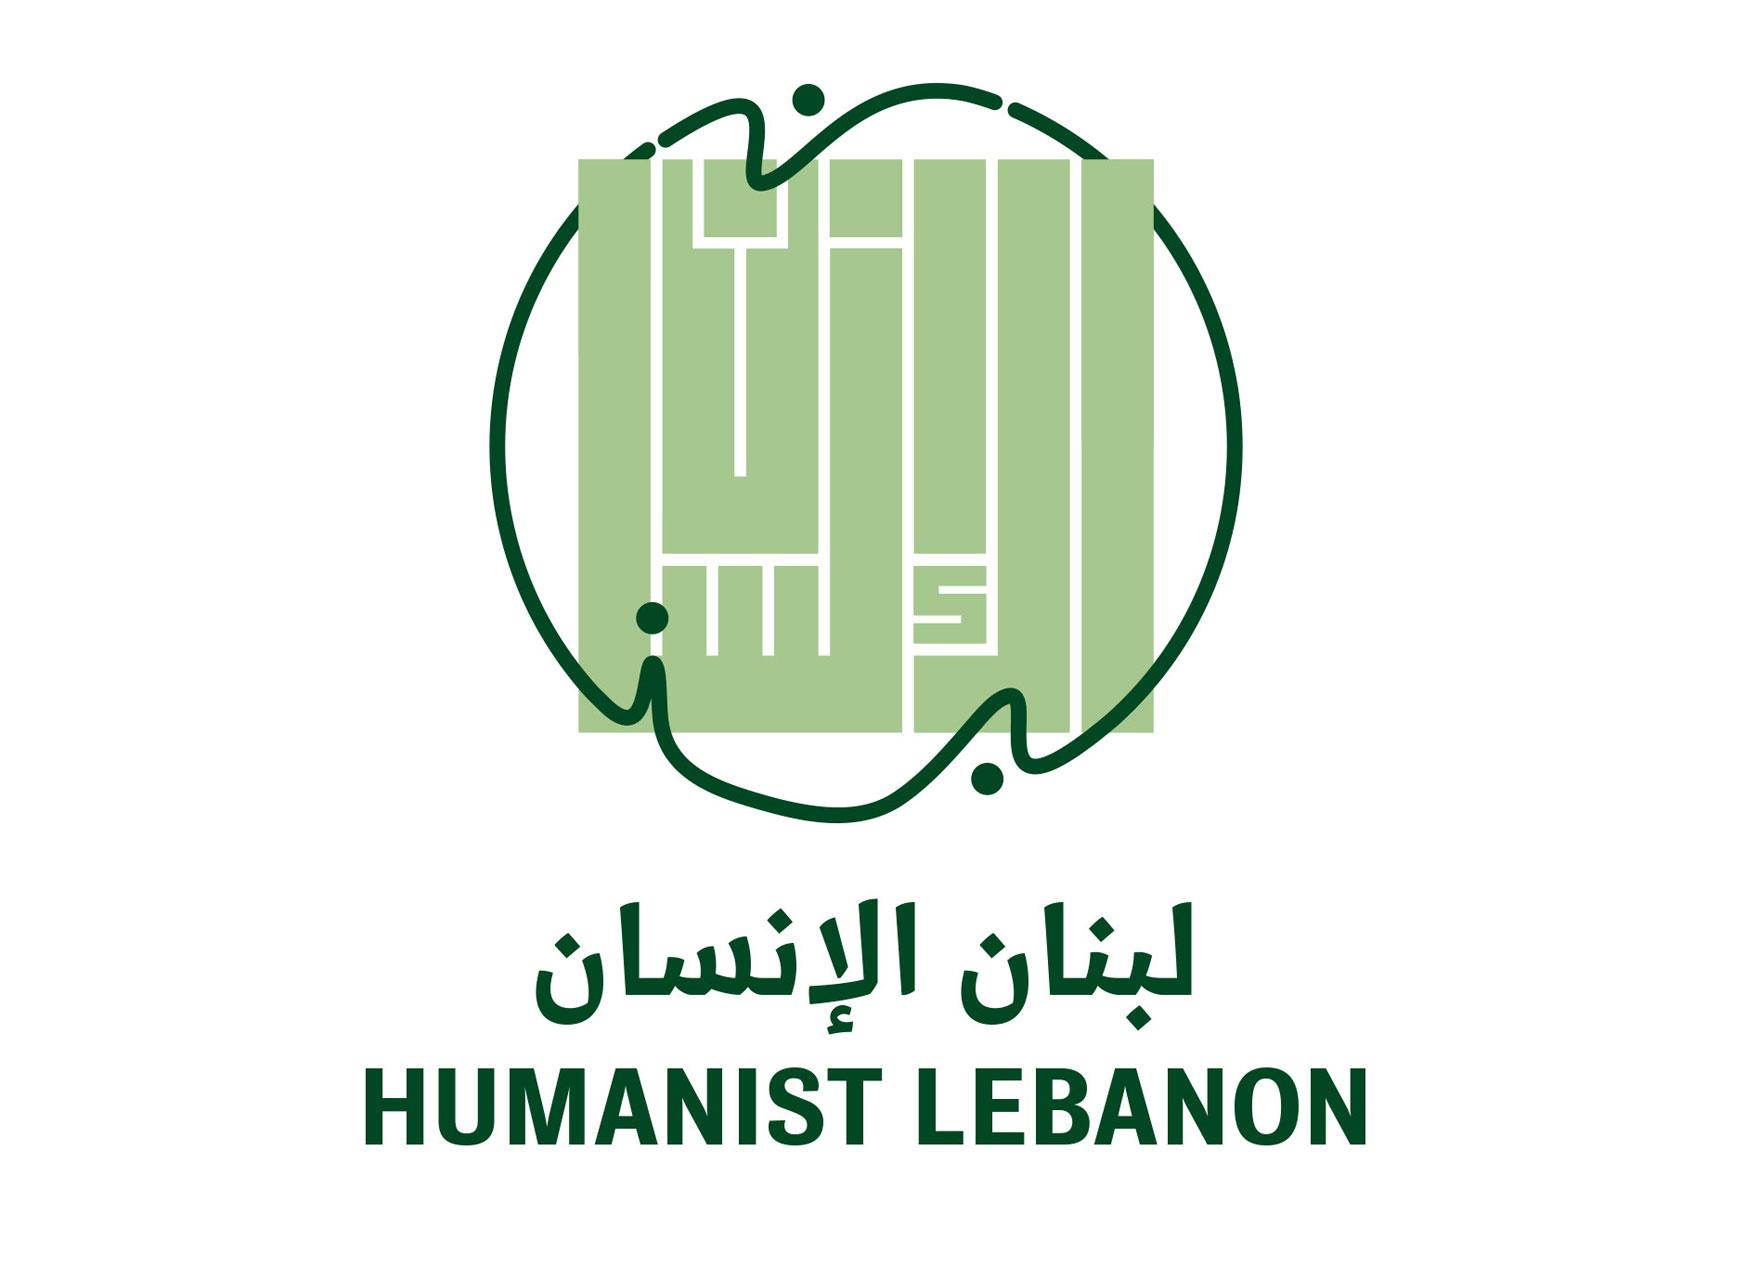 Humanist Lebanon